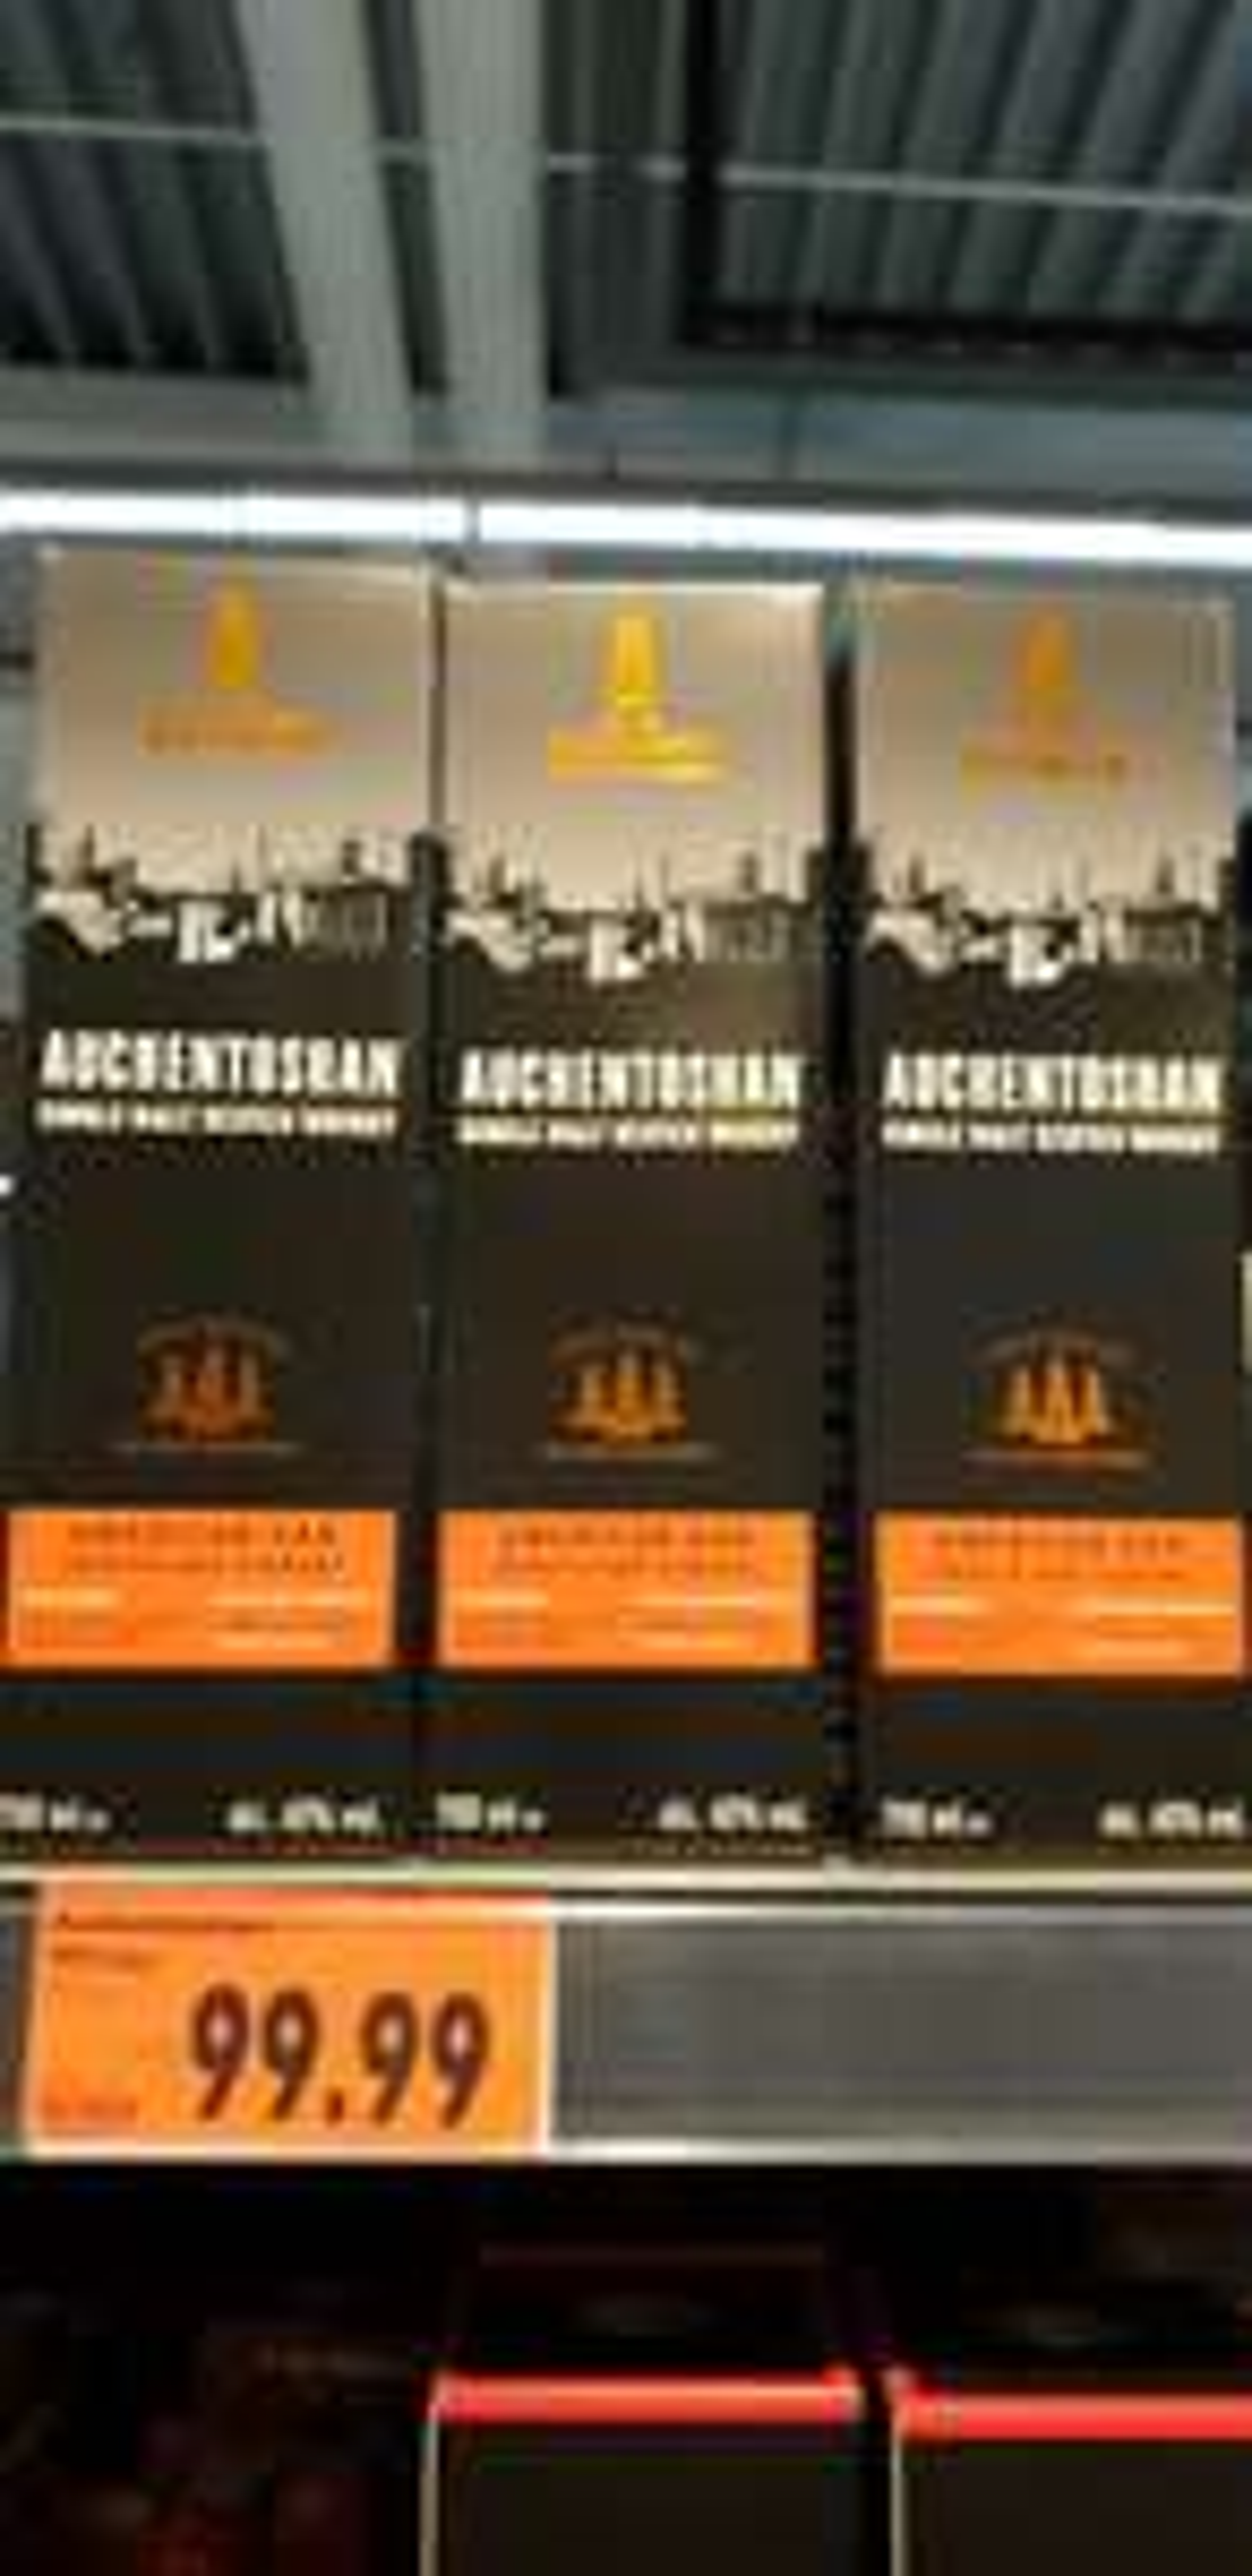 Auchentoshan American Oak Smooth and Vibrant KAUFLAND